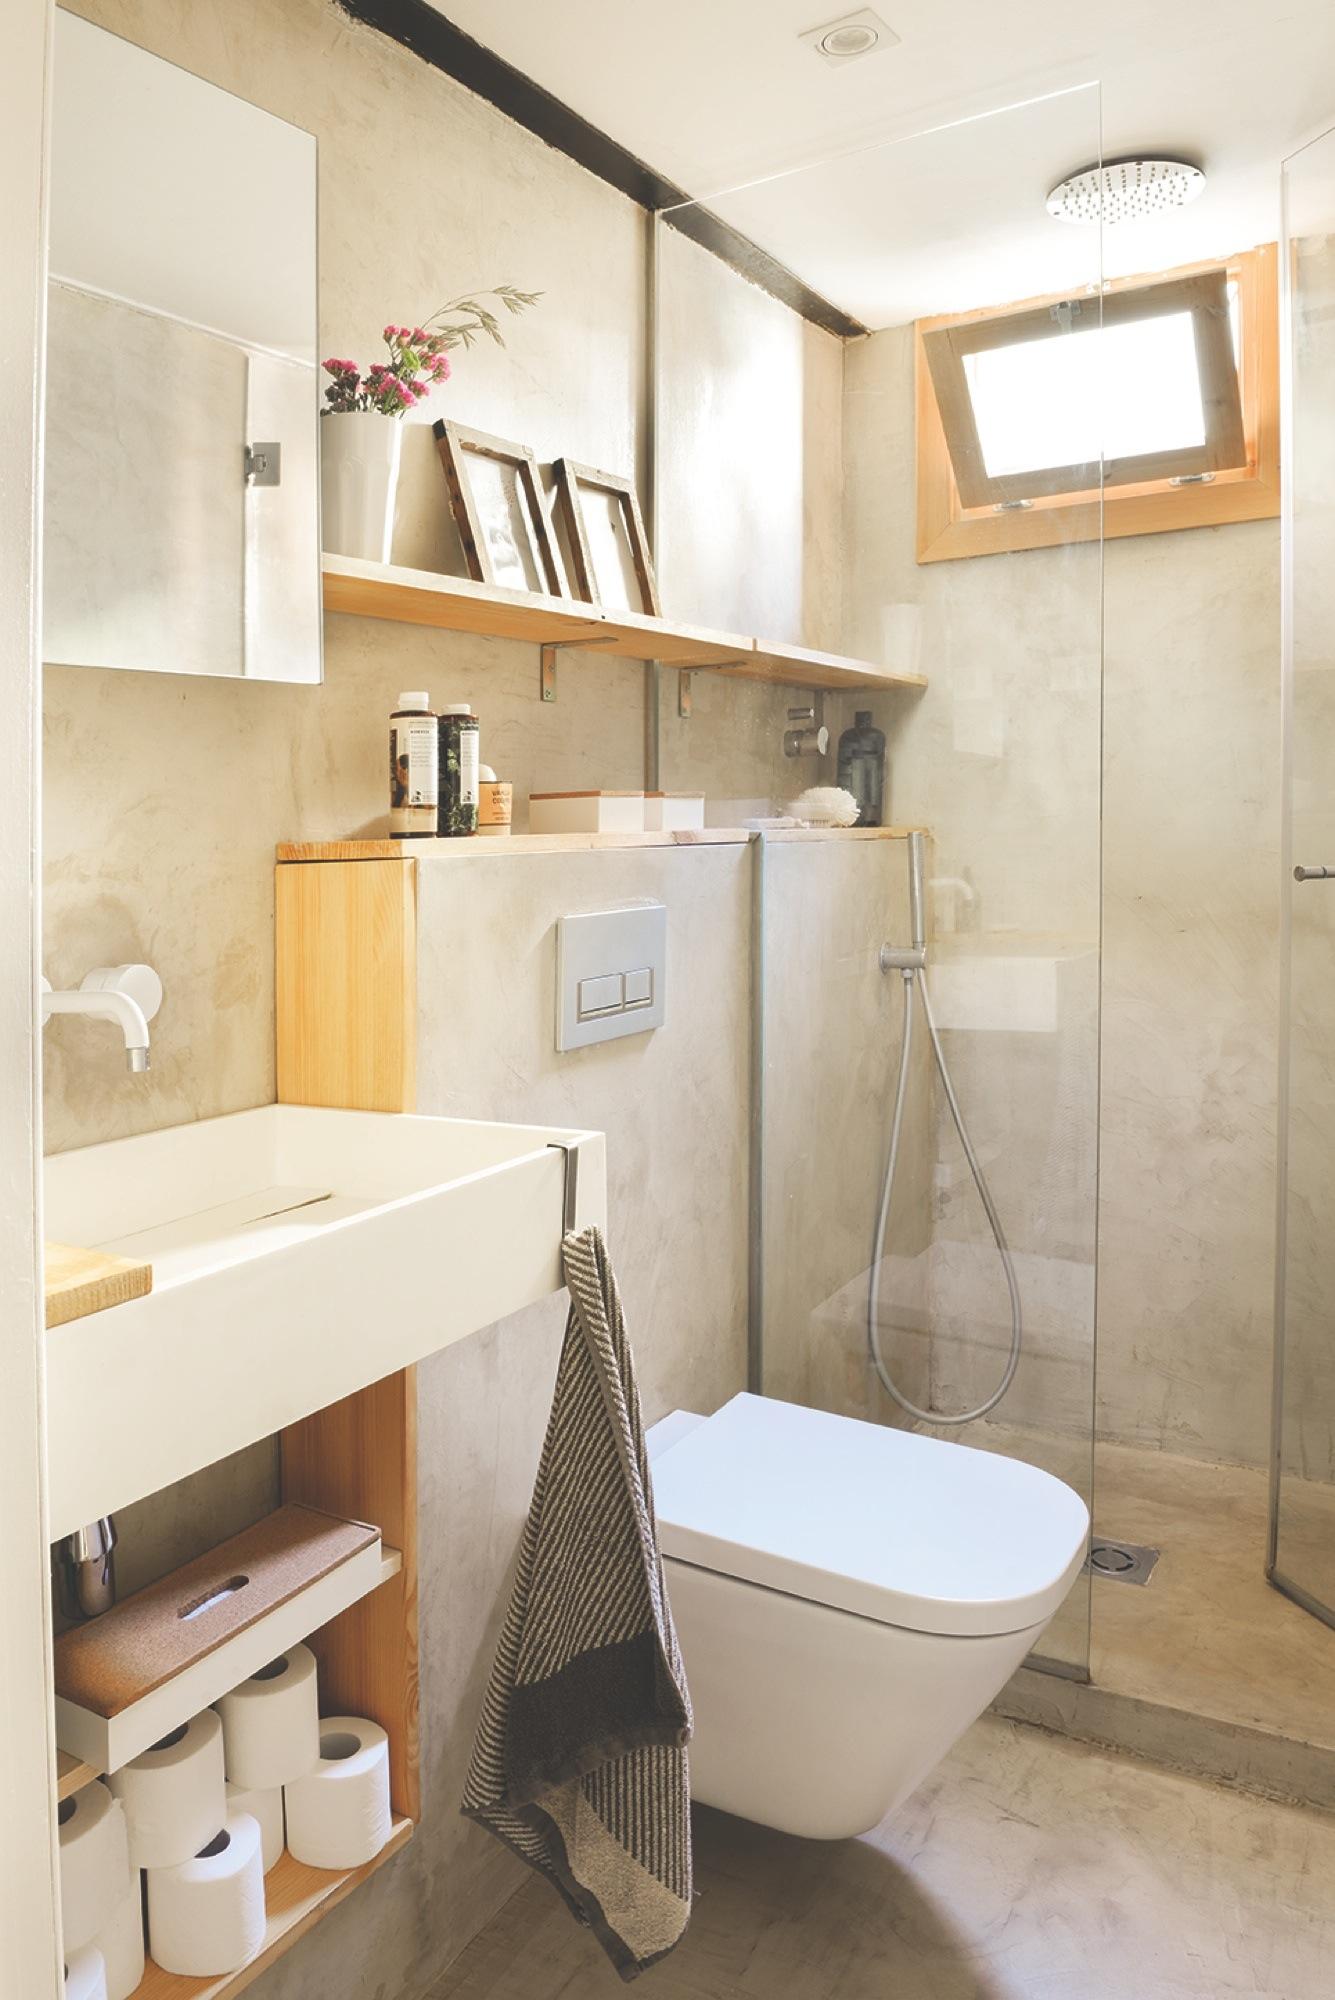 Baño Pequeno Microcemento:Mesas de centro de diferentes alturas y colores diseñadas por Neus